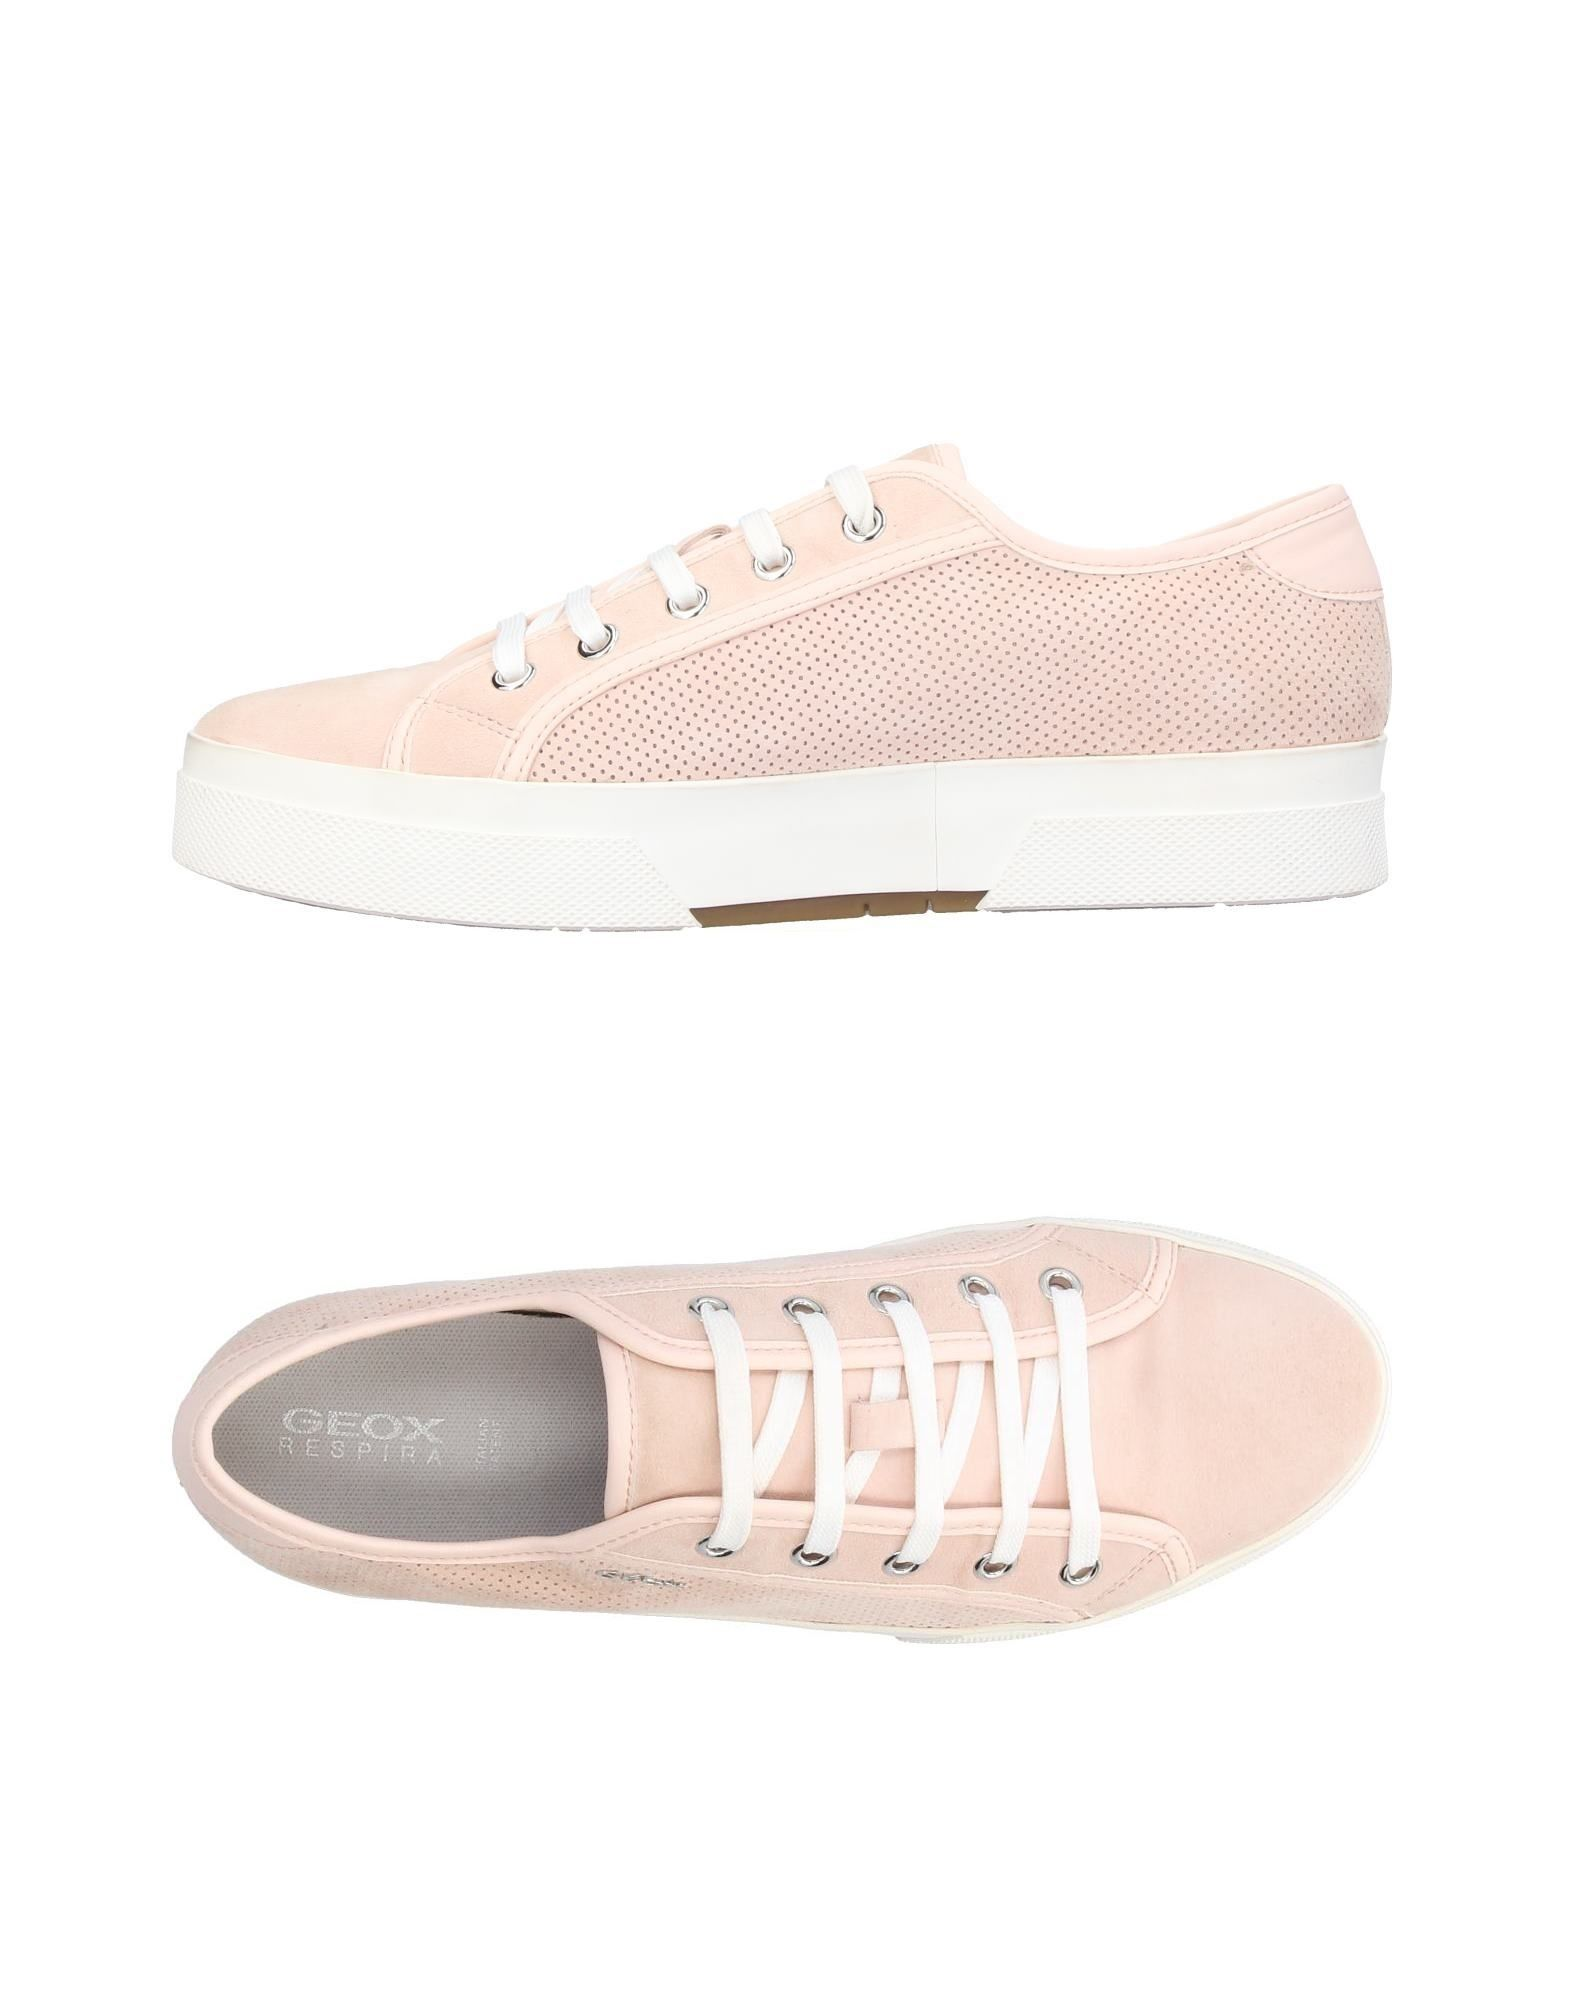 Geox Sneakers Damen  11414186CA Gute Qualität beliebte Schuhe